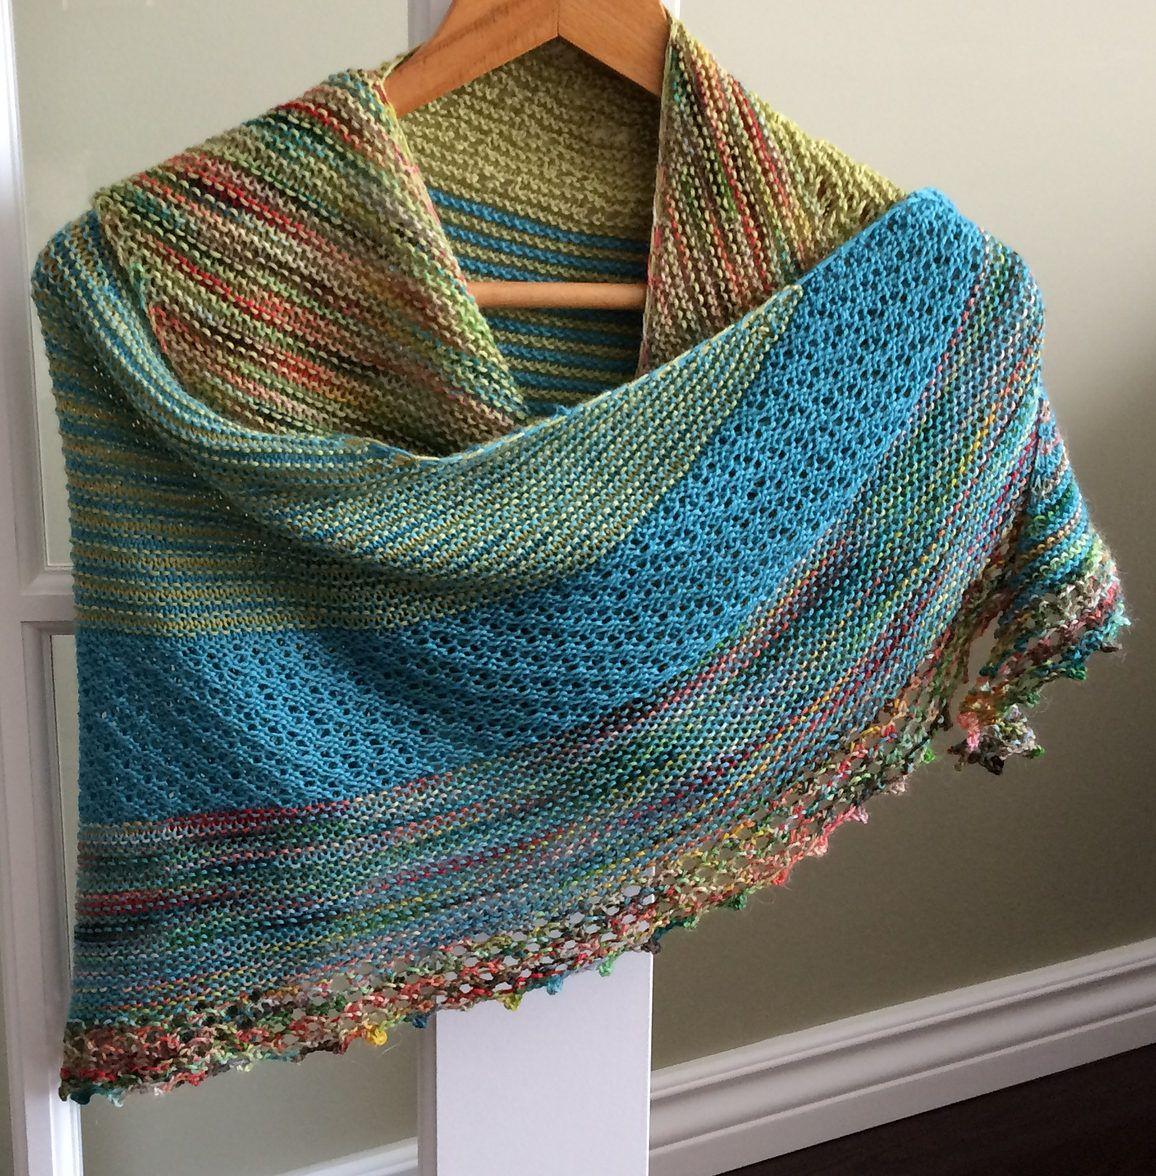 Colorful Shawl Knitting Patterns | Ticking stripe, Lace patterns and ...